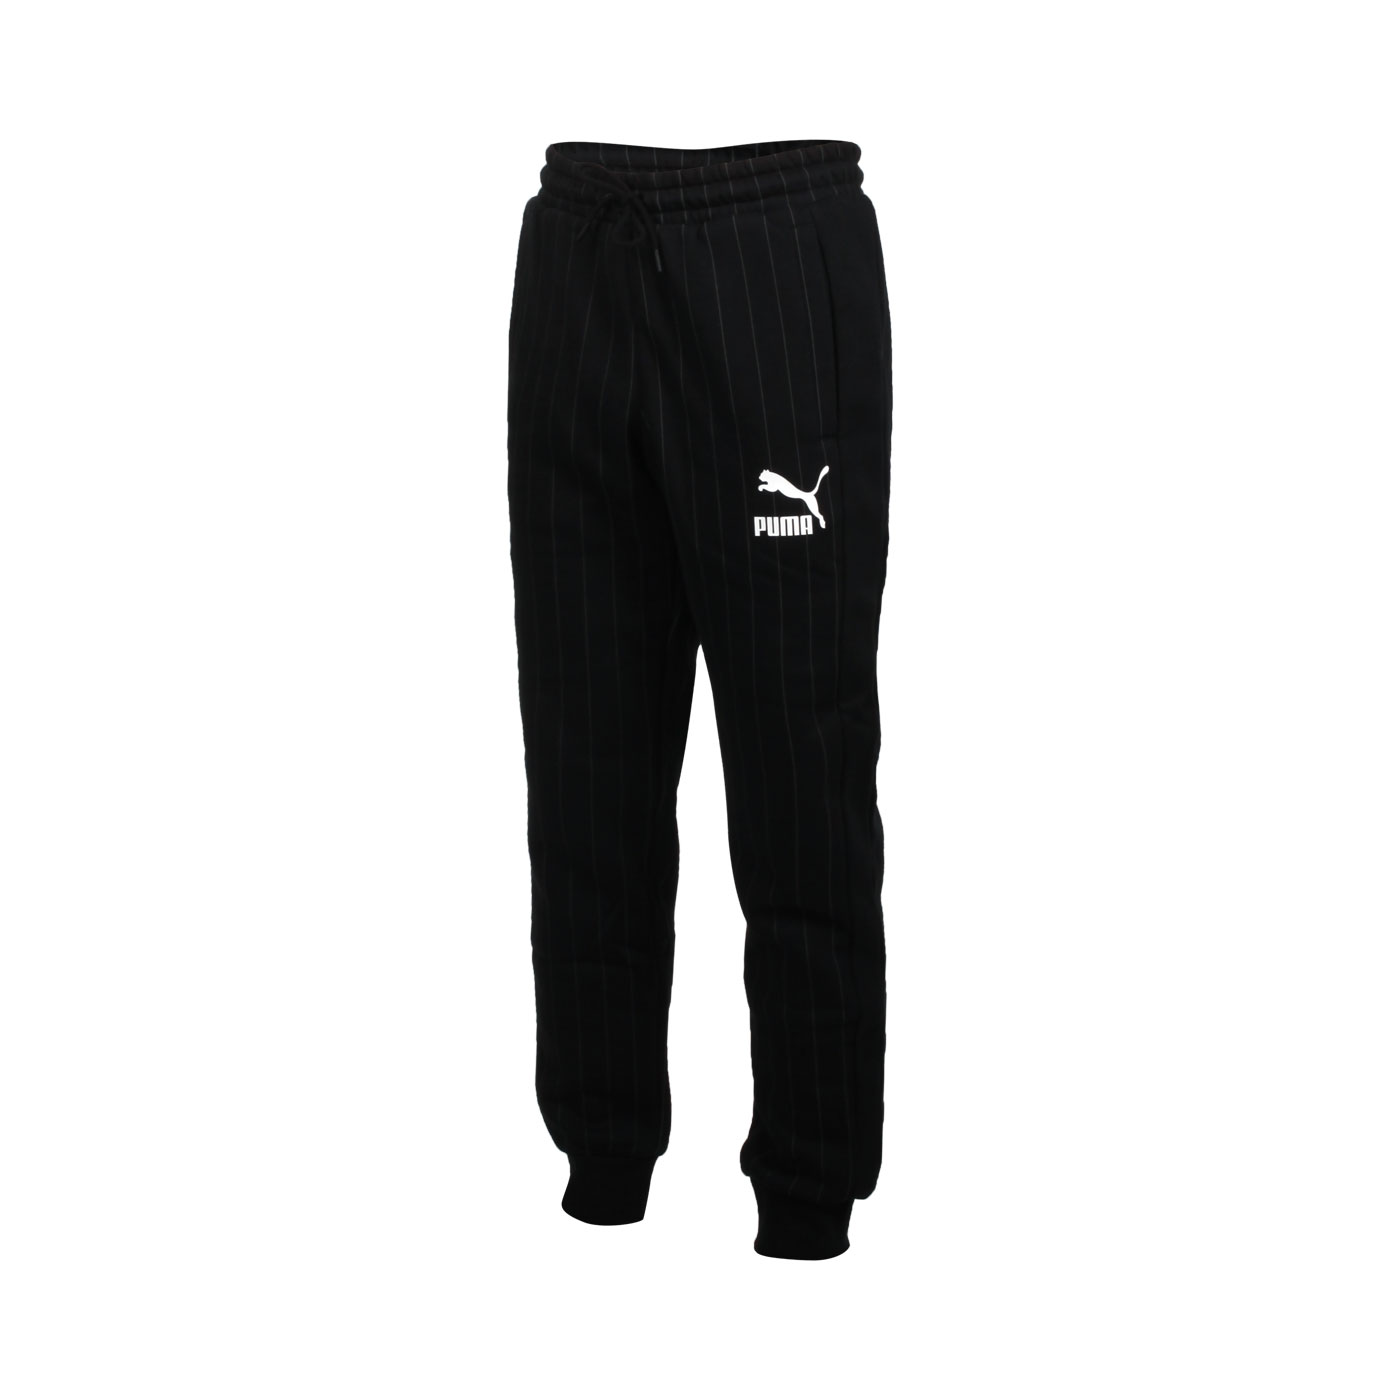 PUMA 男款流行系列內刷毛條紋運動長褲 53017801 - 黑白